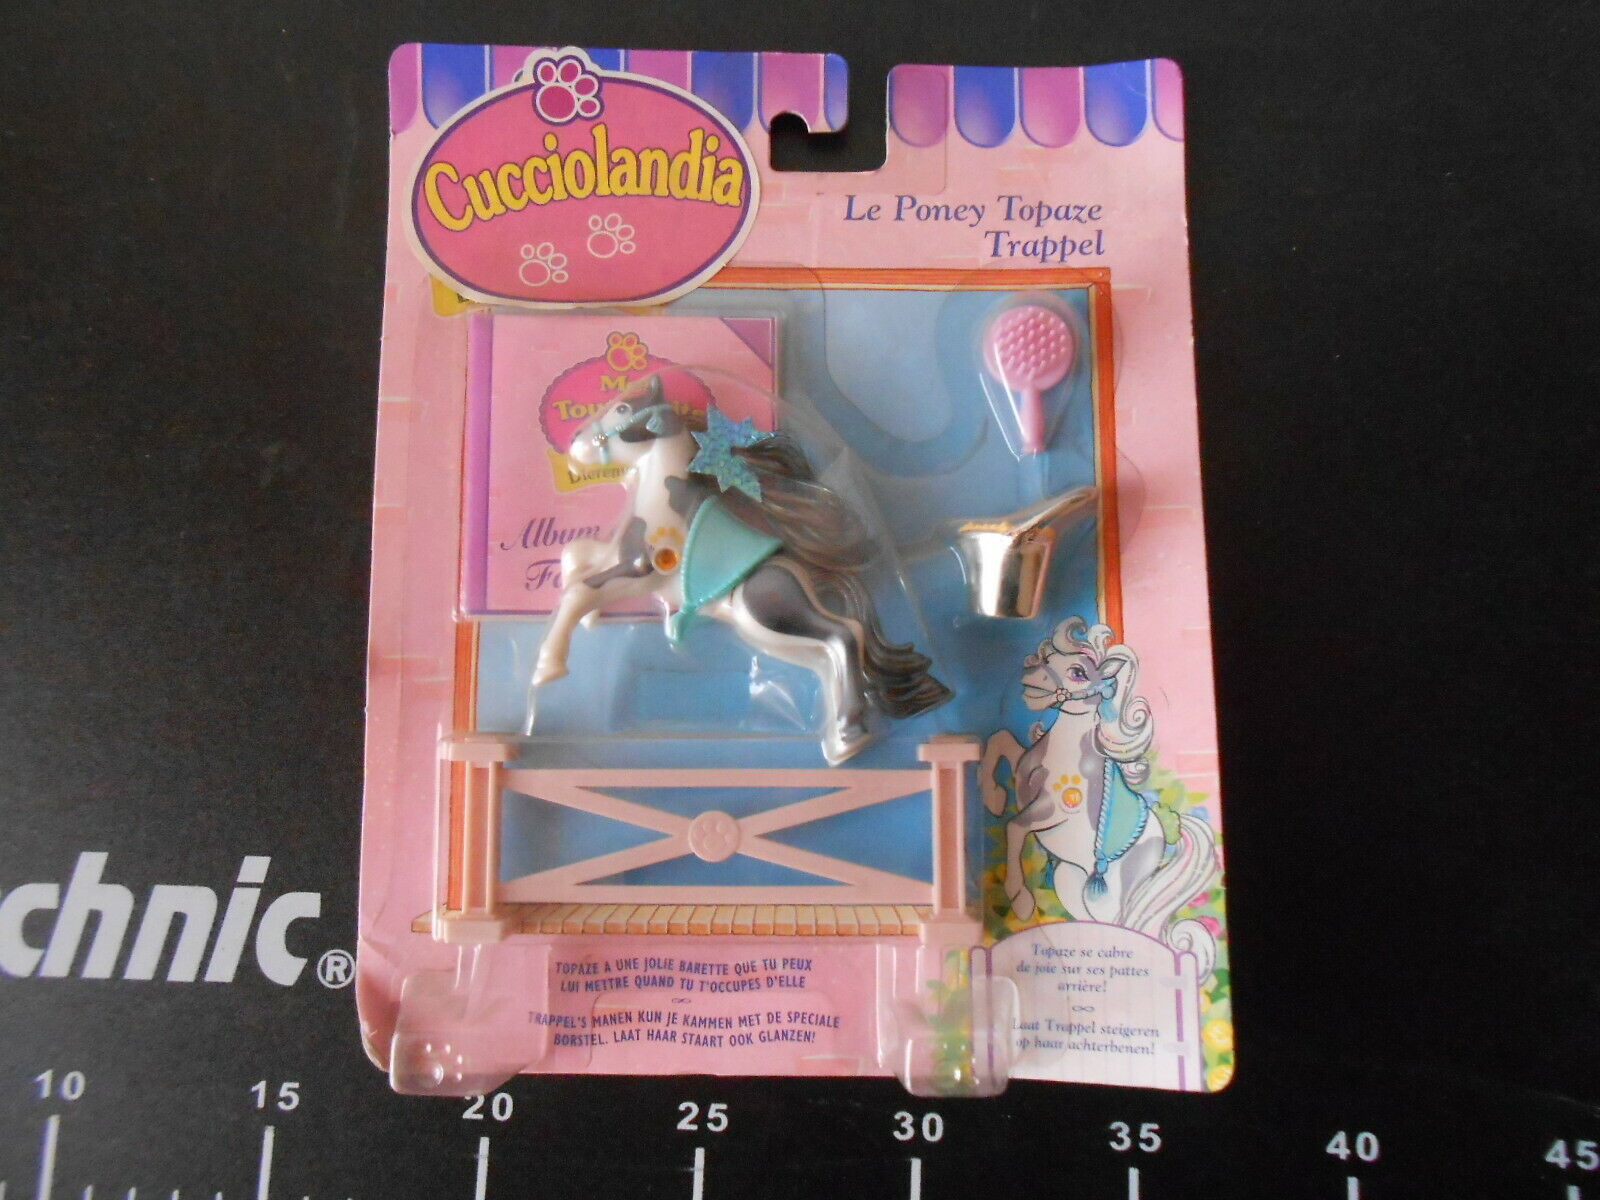 Littlest Pet Shop Cucciolandia Zoo Kenner Poney Topaze Trappel Horse Playset